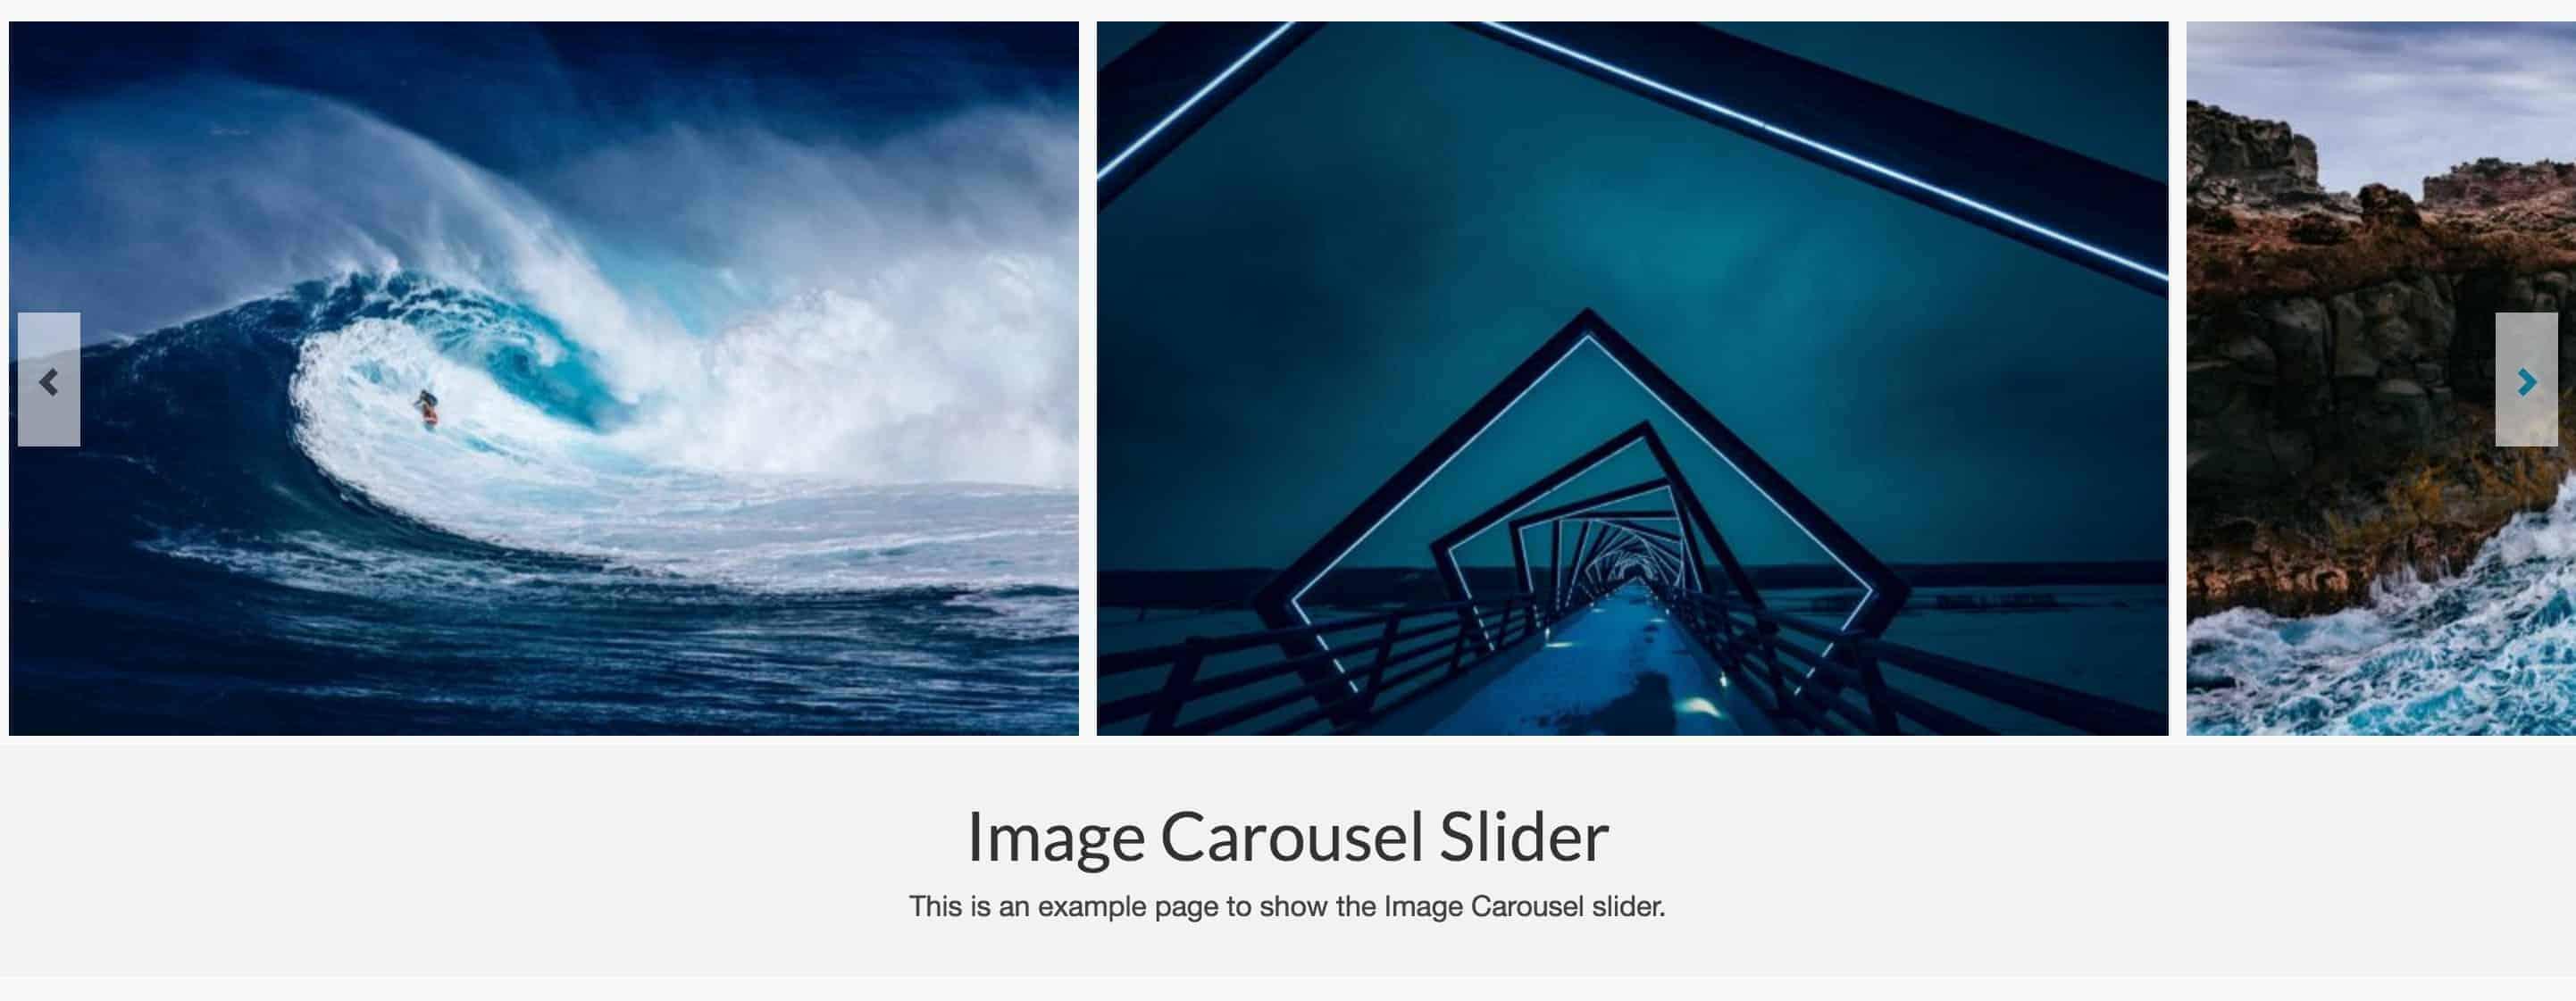 Image Carousel Example